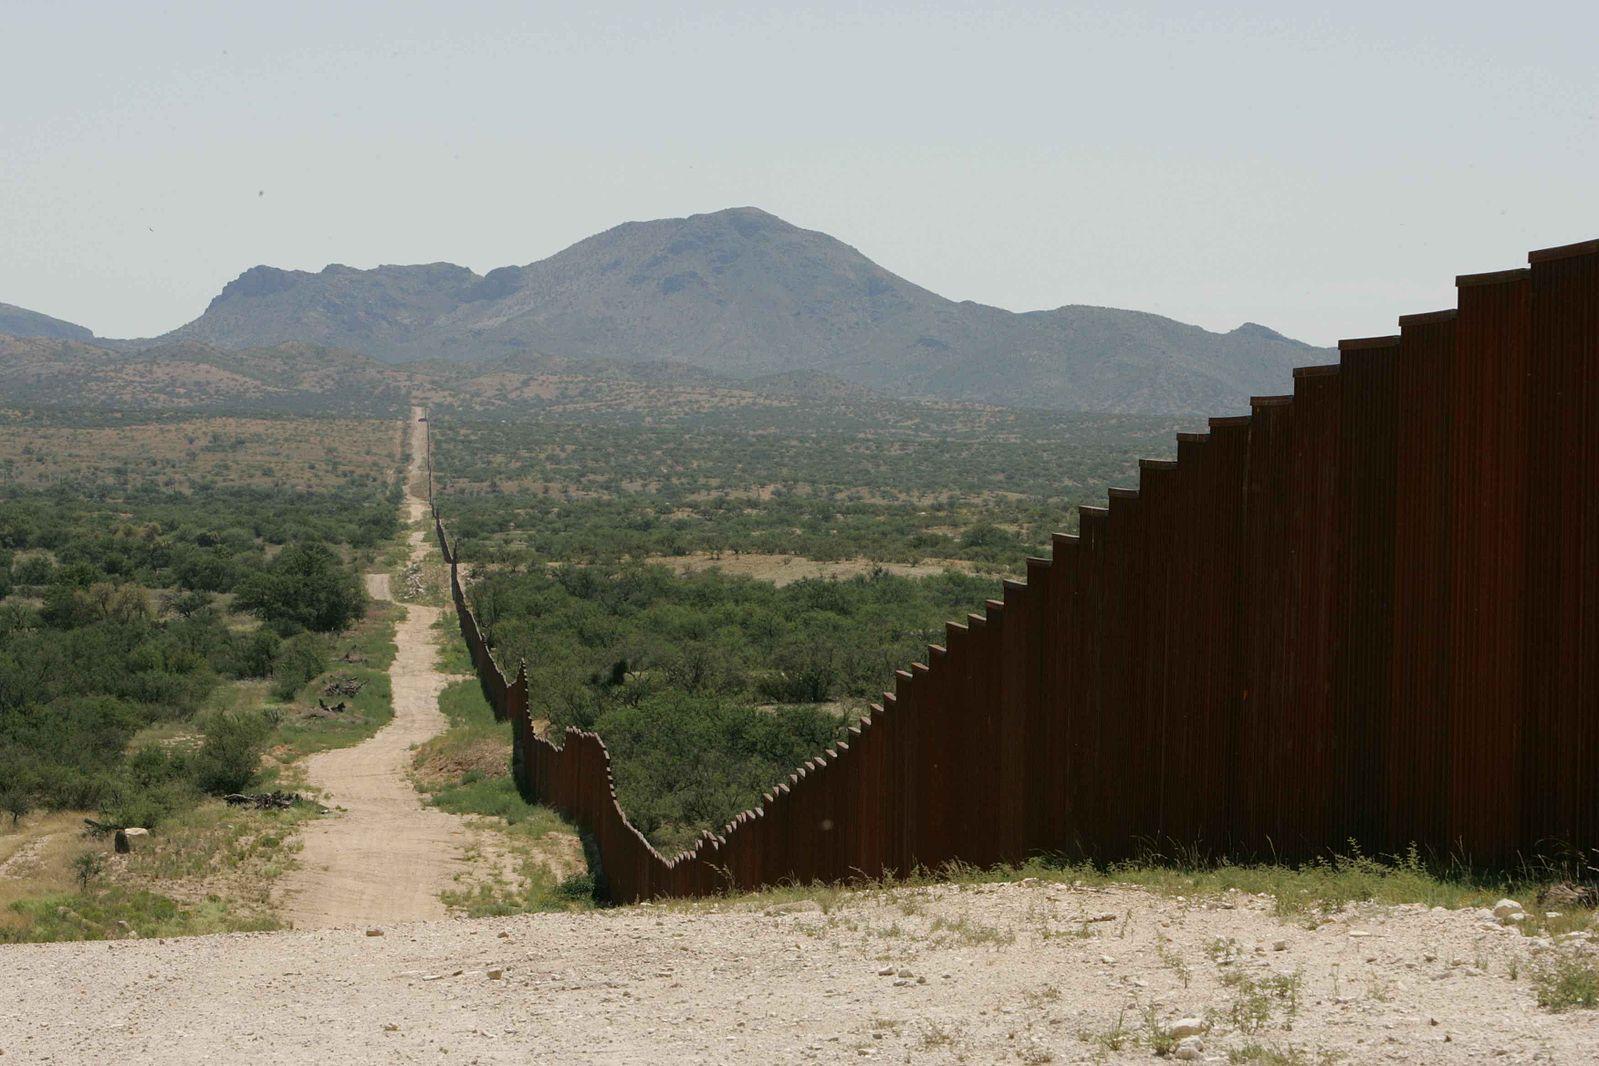 Construction to Begin on 4 Trump Border Wall Prototypes